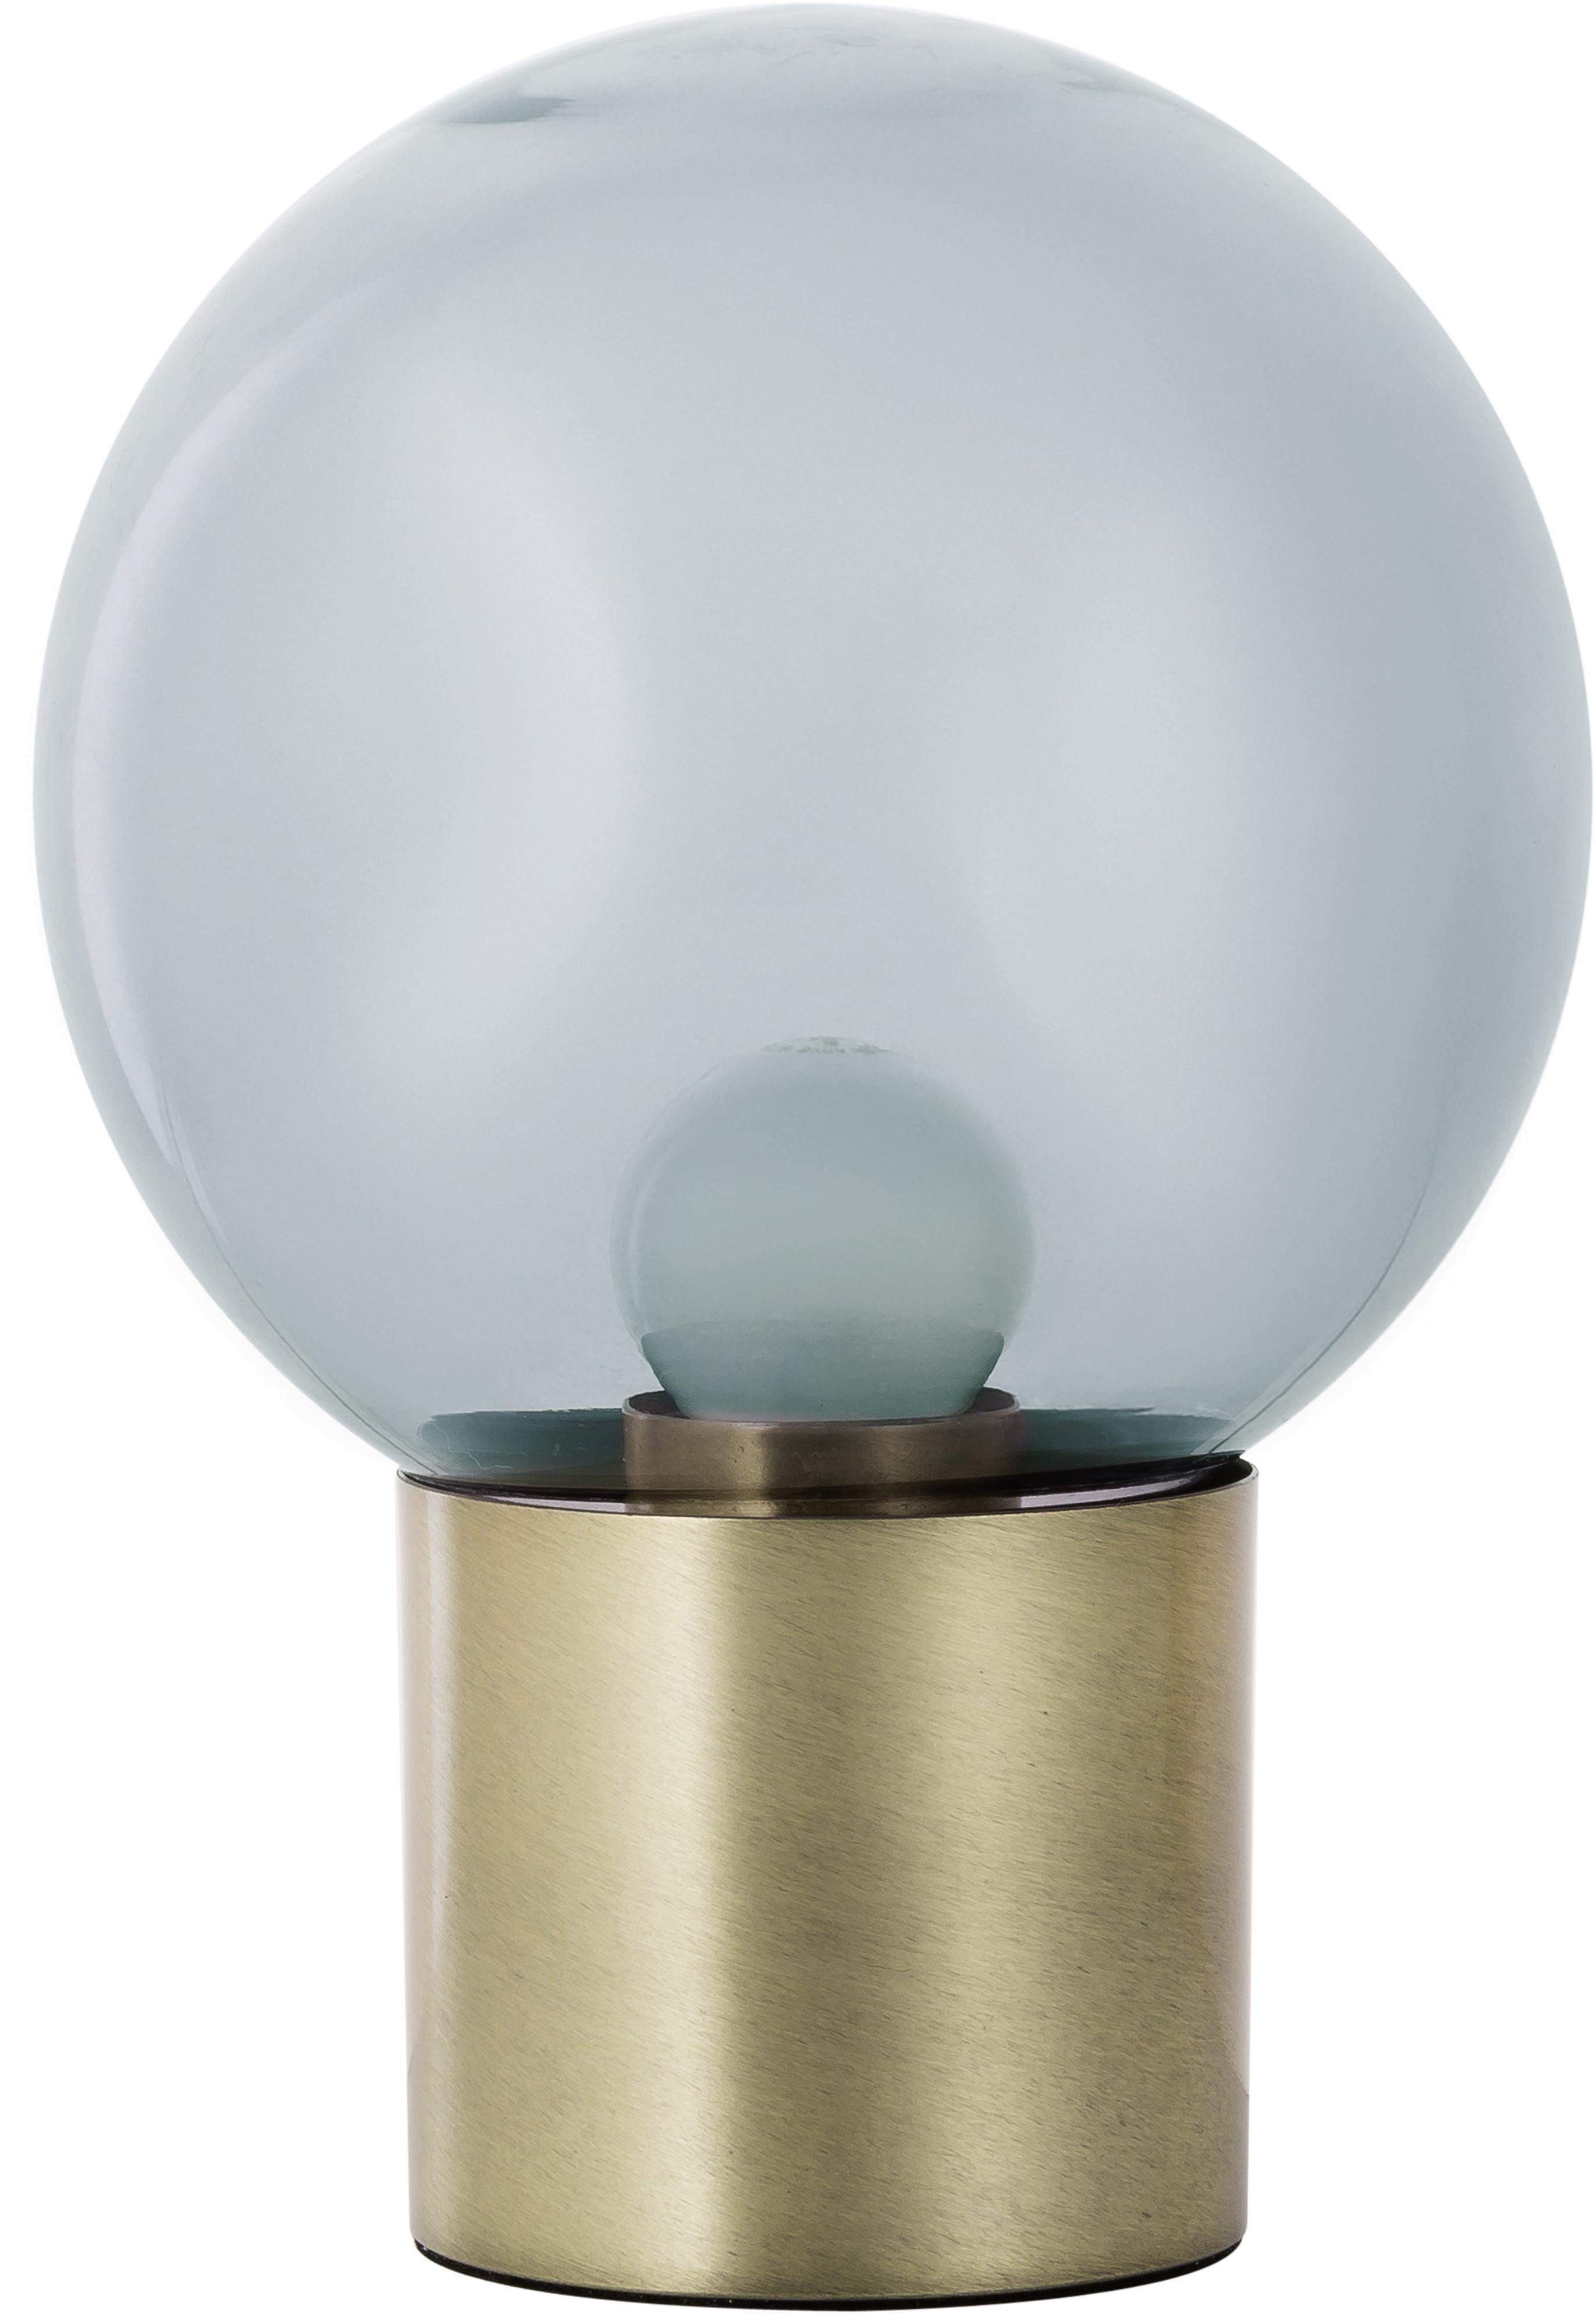 Retro-Tischlampe Lark aus Glas, Lampenschirm: Glas, Lampenschirm: Grau, transparentLampenfuss: Messingfarben, matt, Ø 17 x H 24 cm